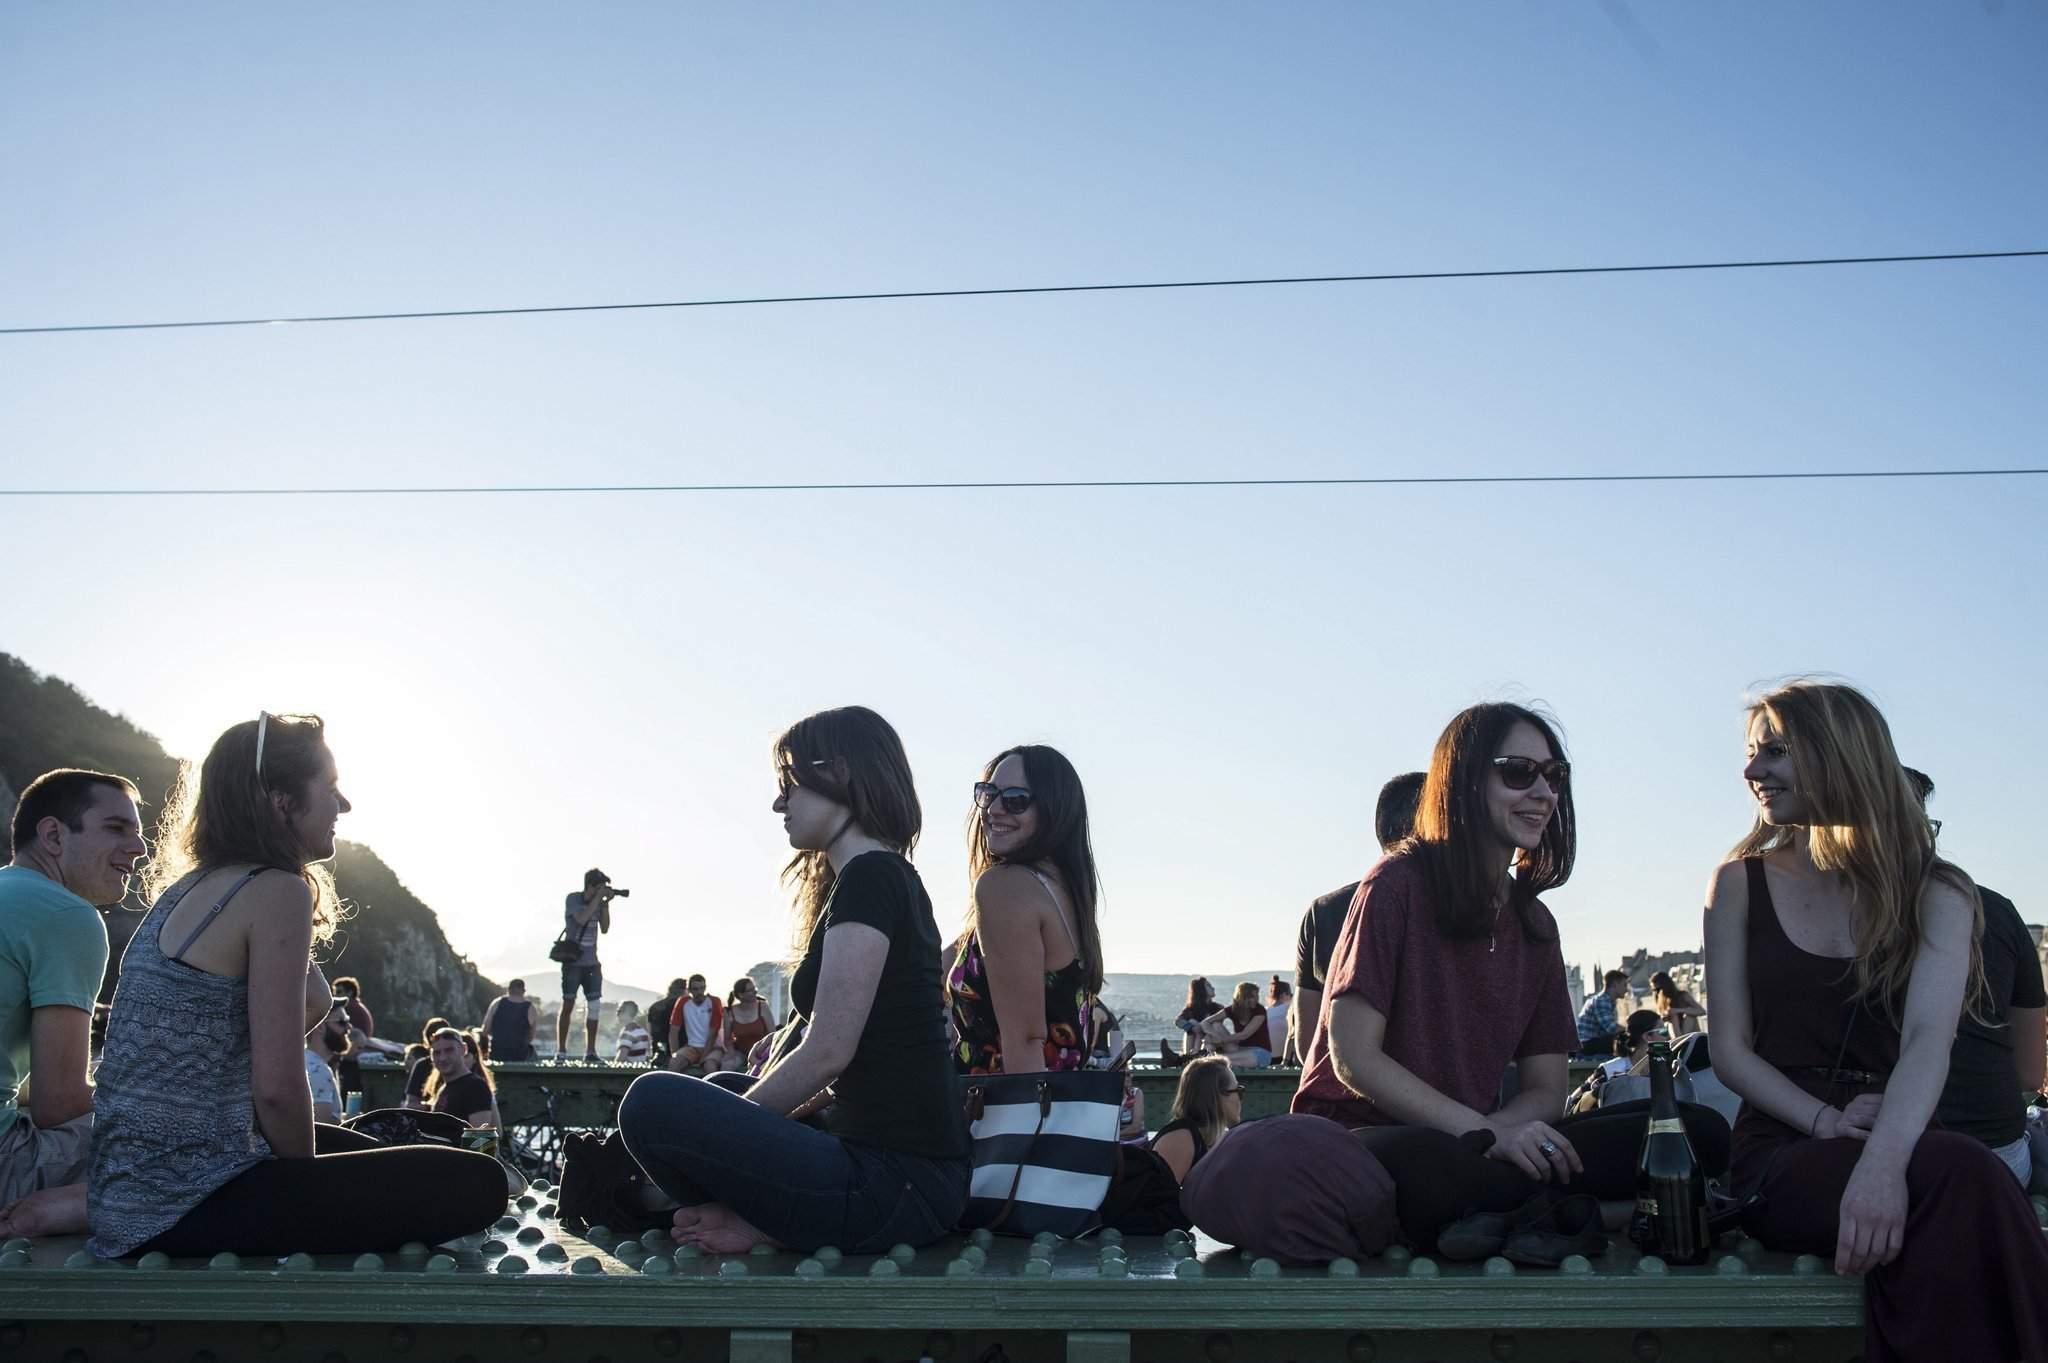 Hundreds of people occupied Liberty Bridge – VIDEO